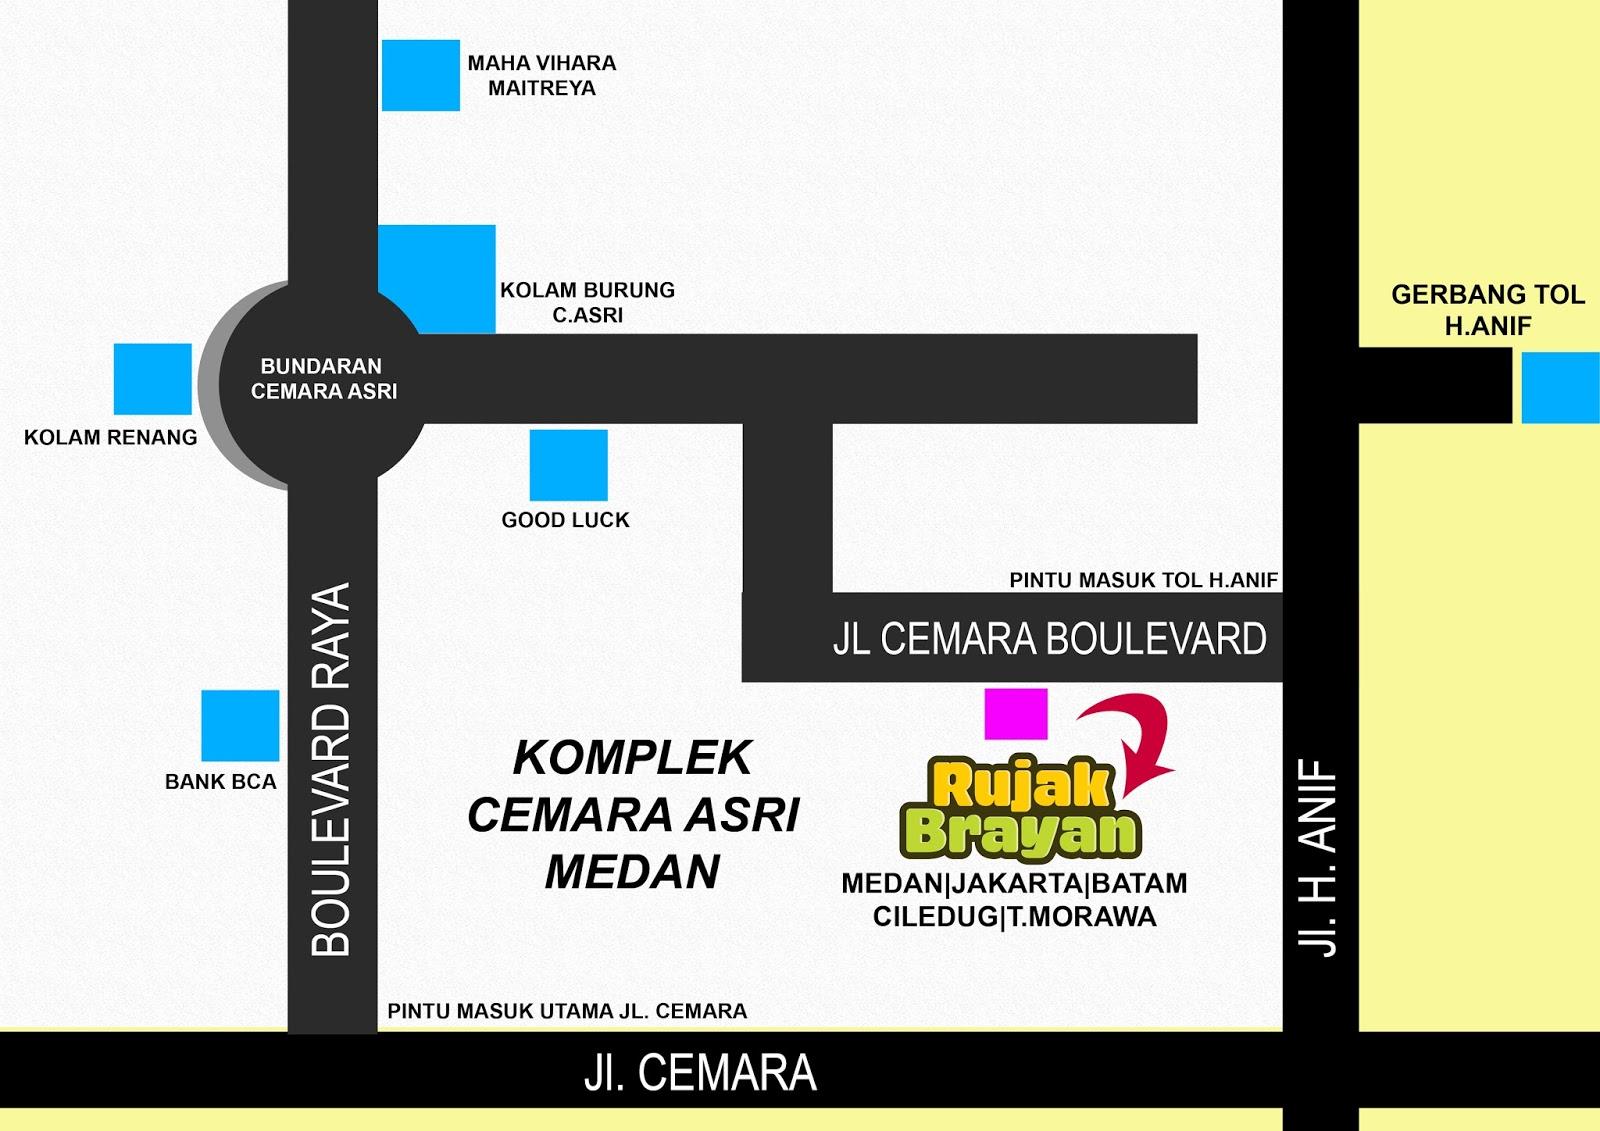 Rujak Brayan 6 Cabang Franchise Kota Medan Cemara Asri